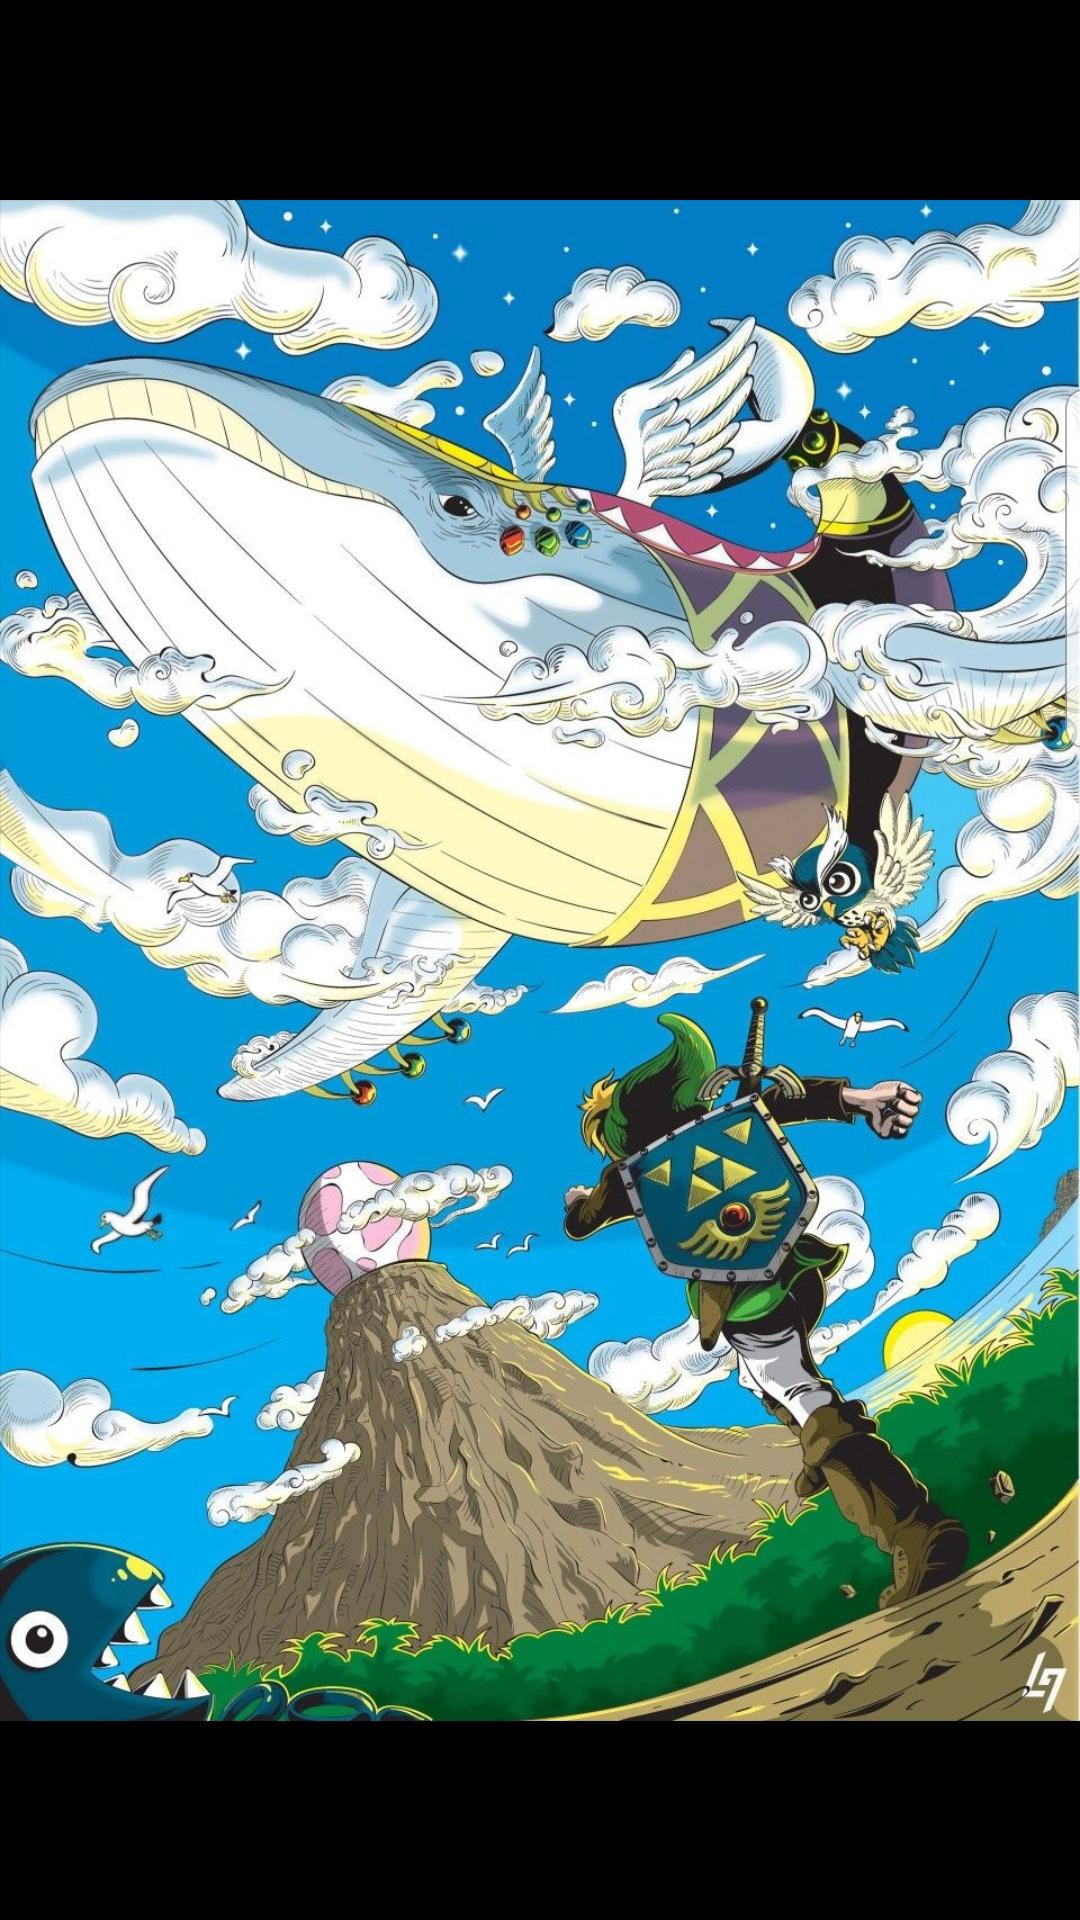 Zelda A Link's Awakening Remastered